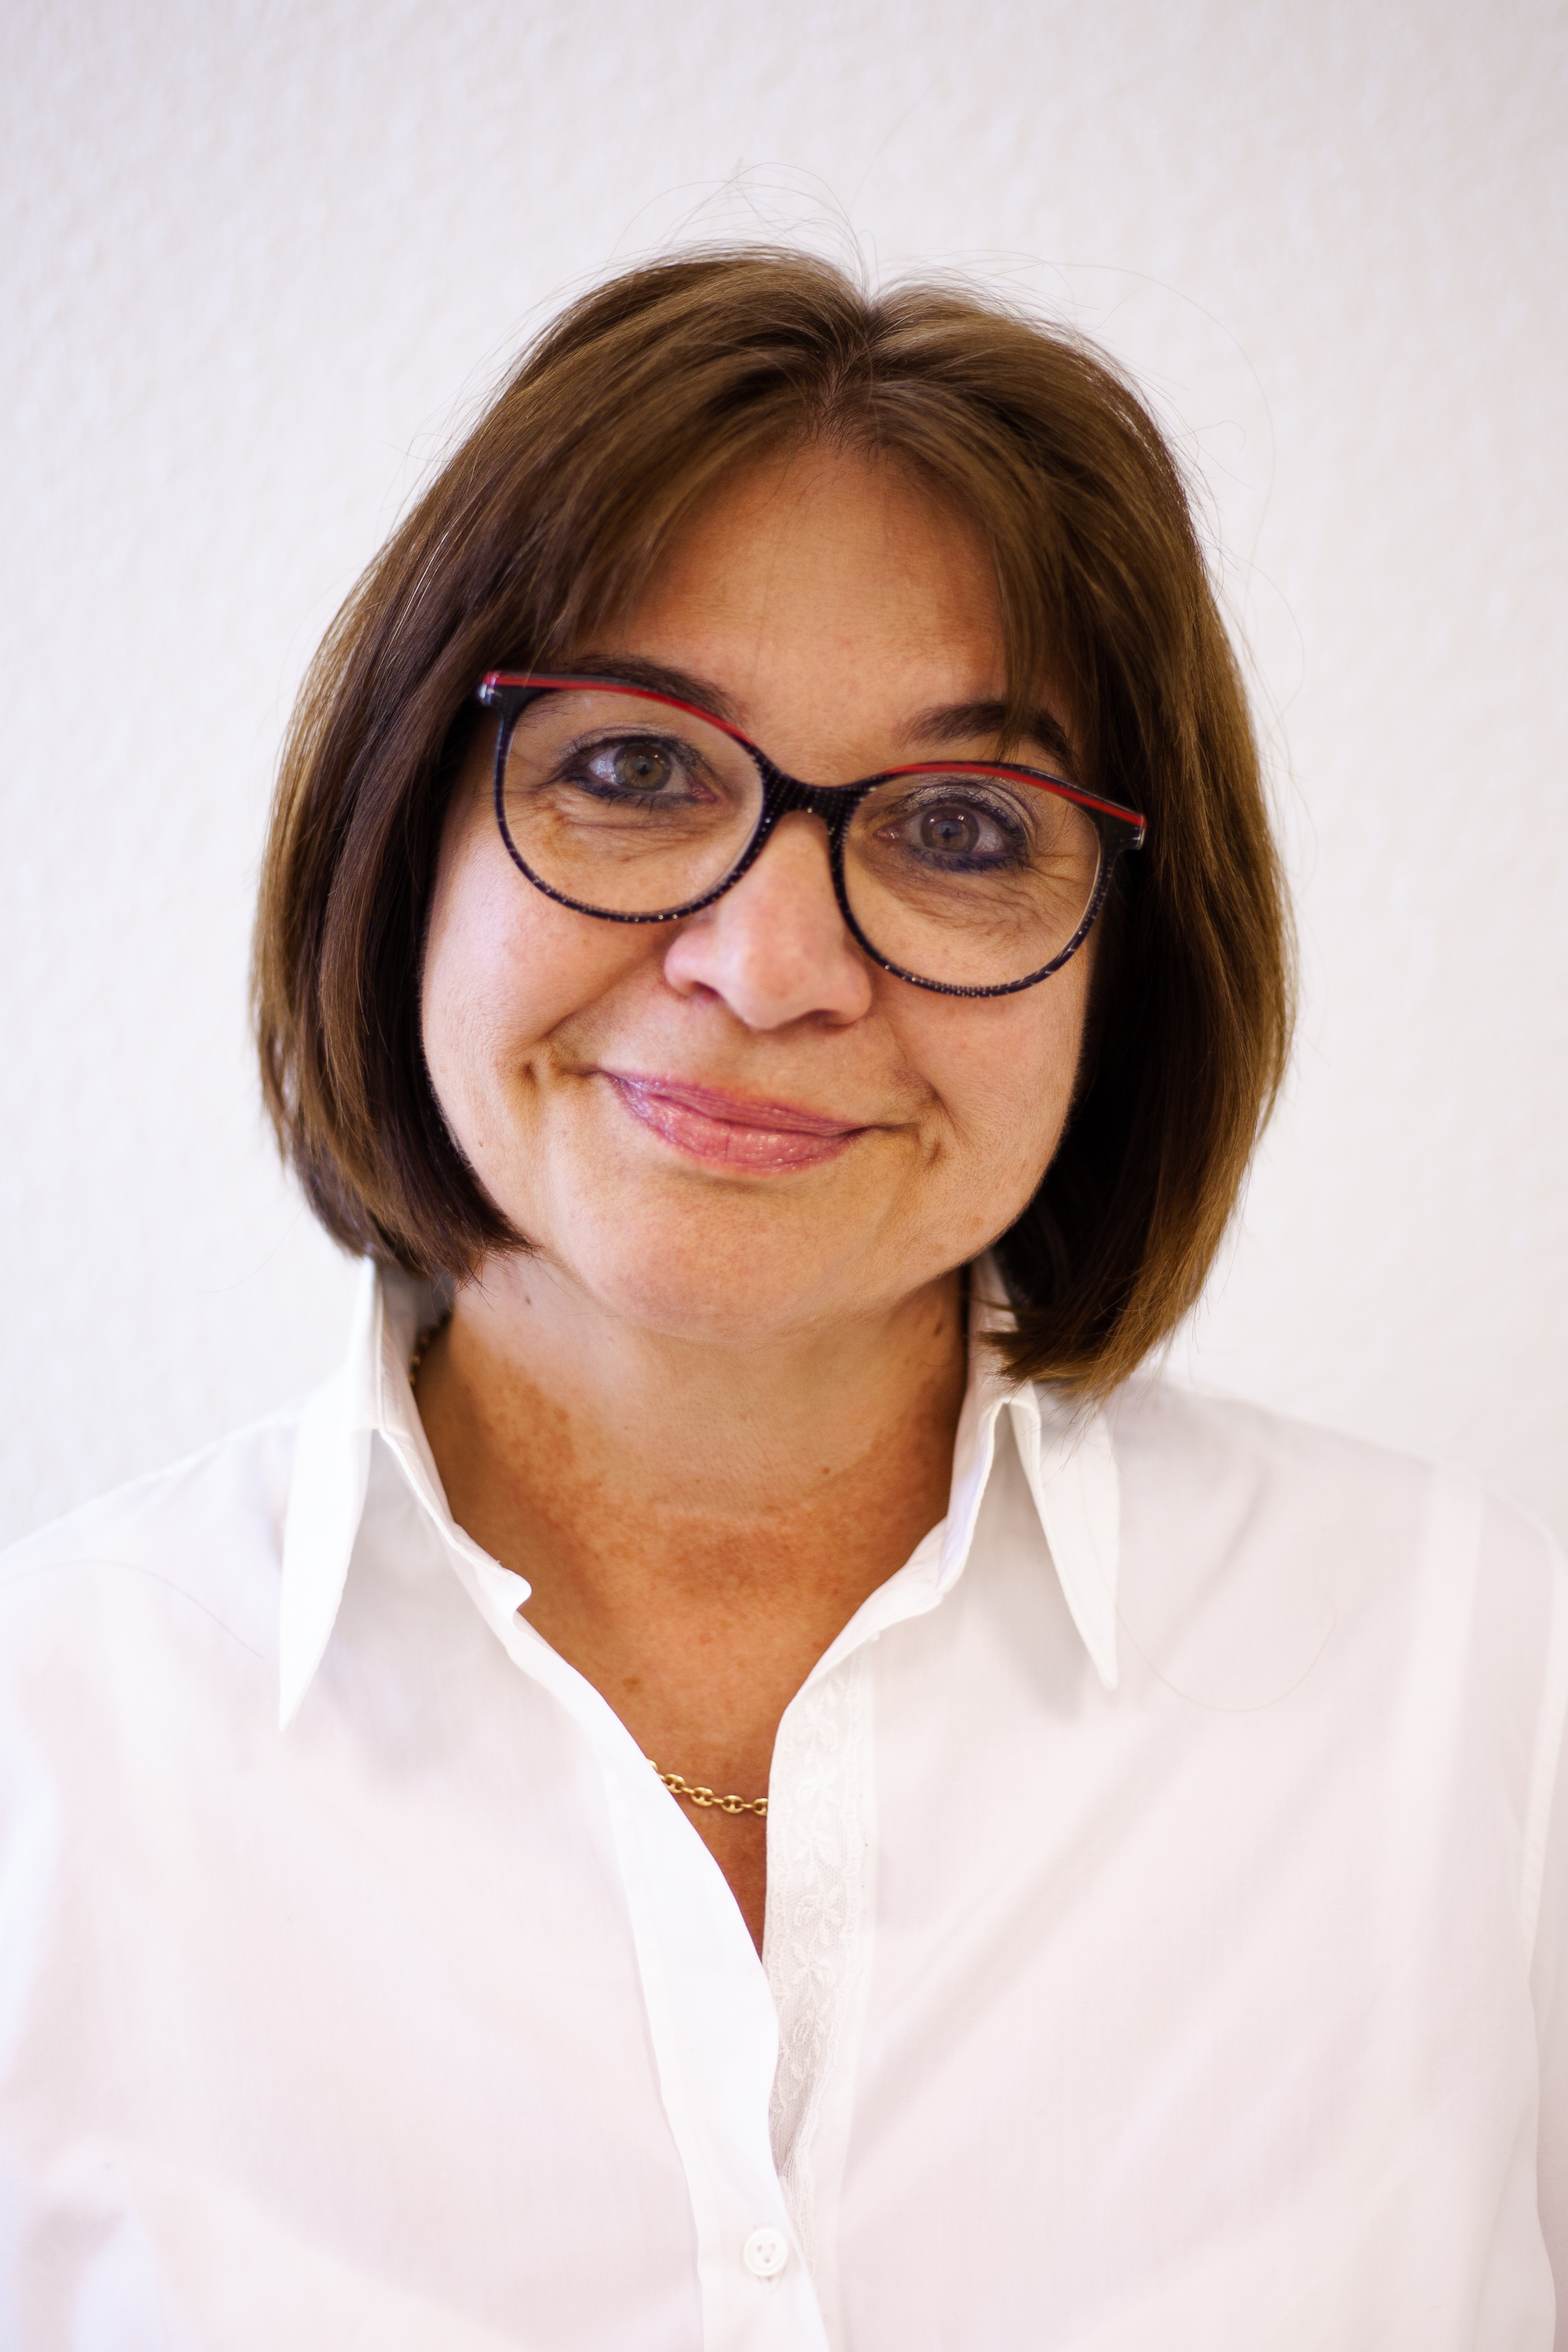 Dr. Sabine Grosser-Panagakos